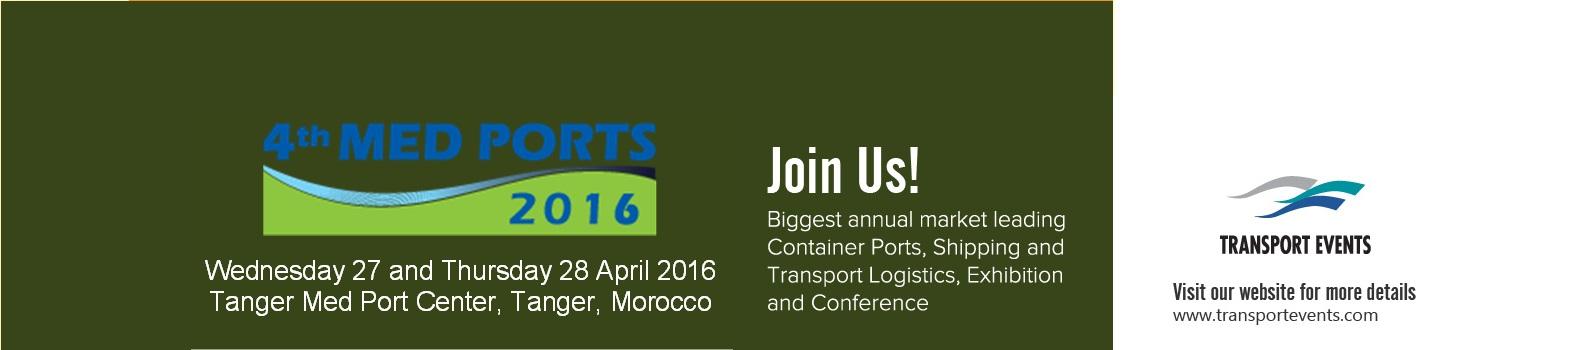 Morroco-27-28-April-2016-Banner-Website1